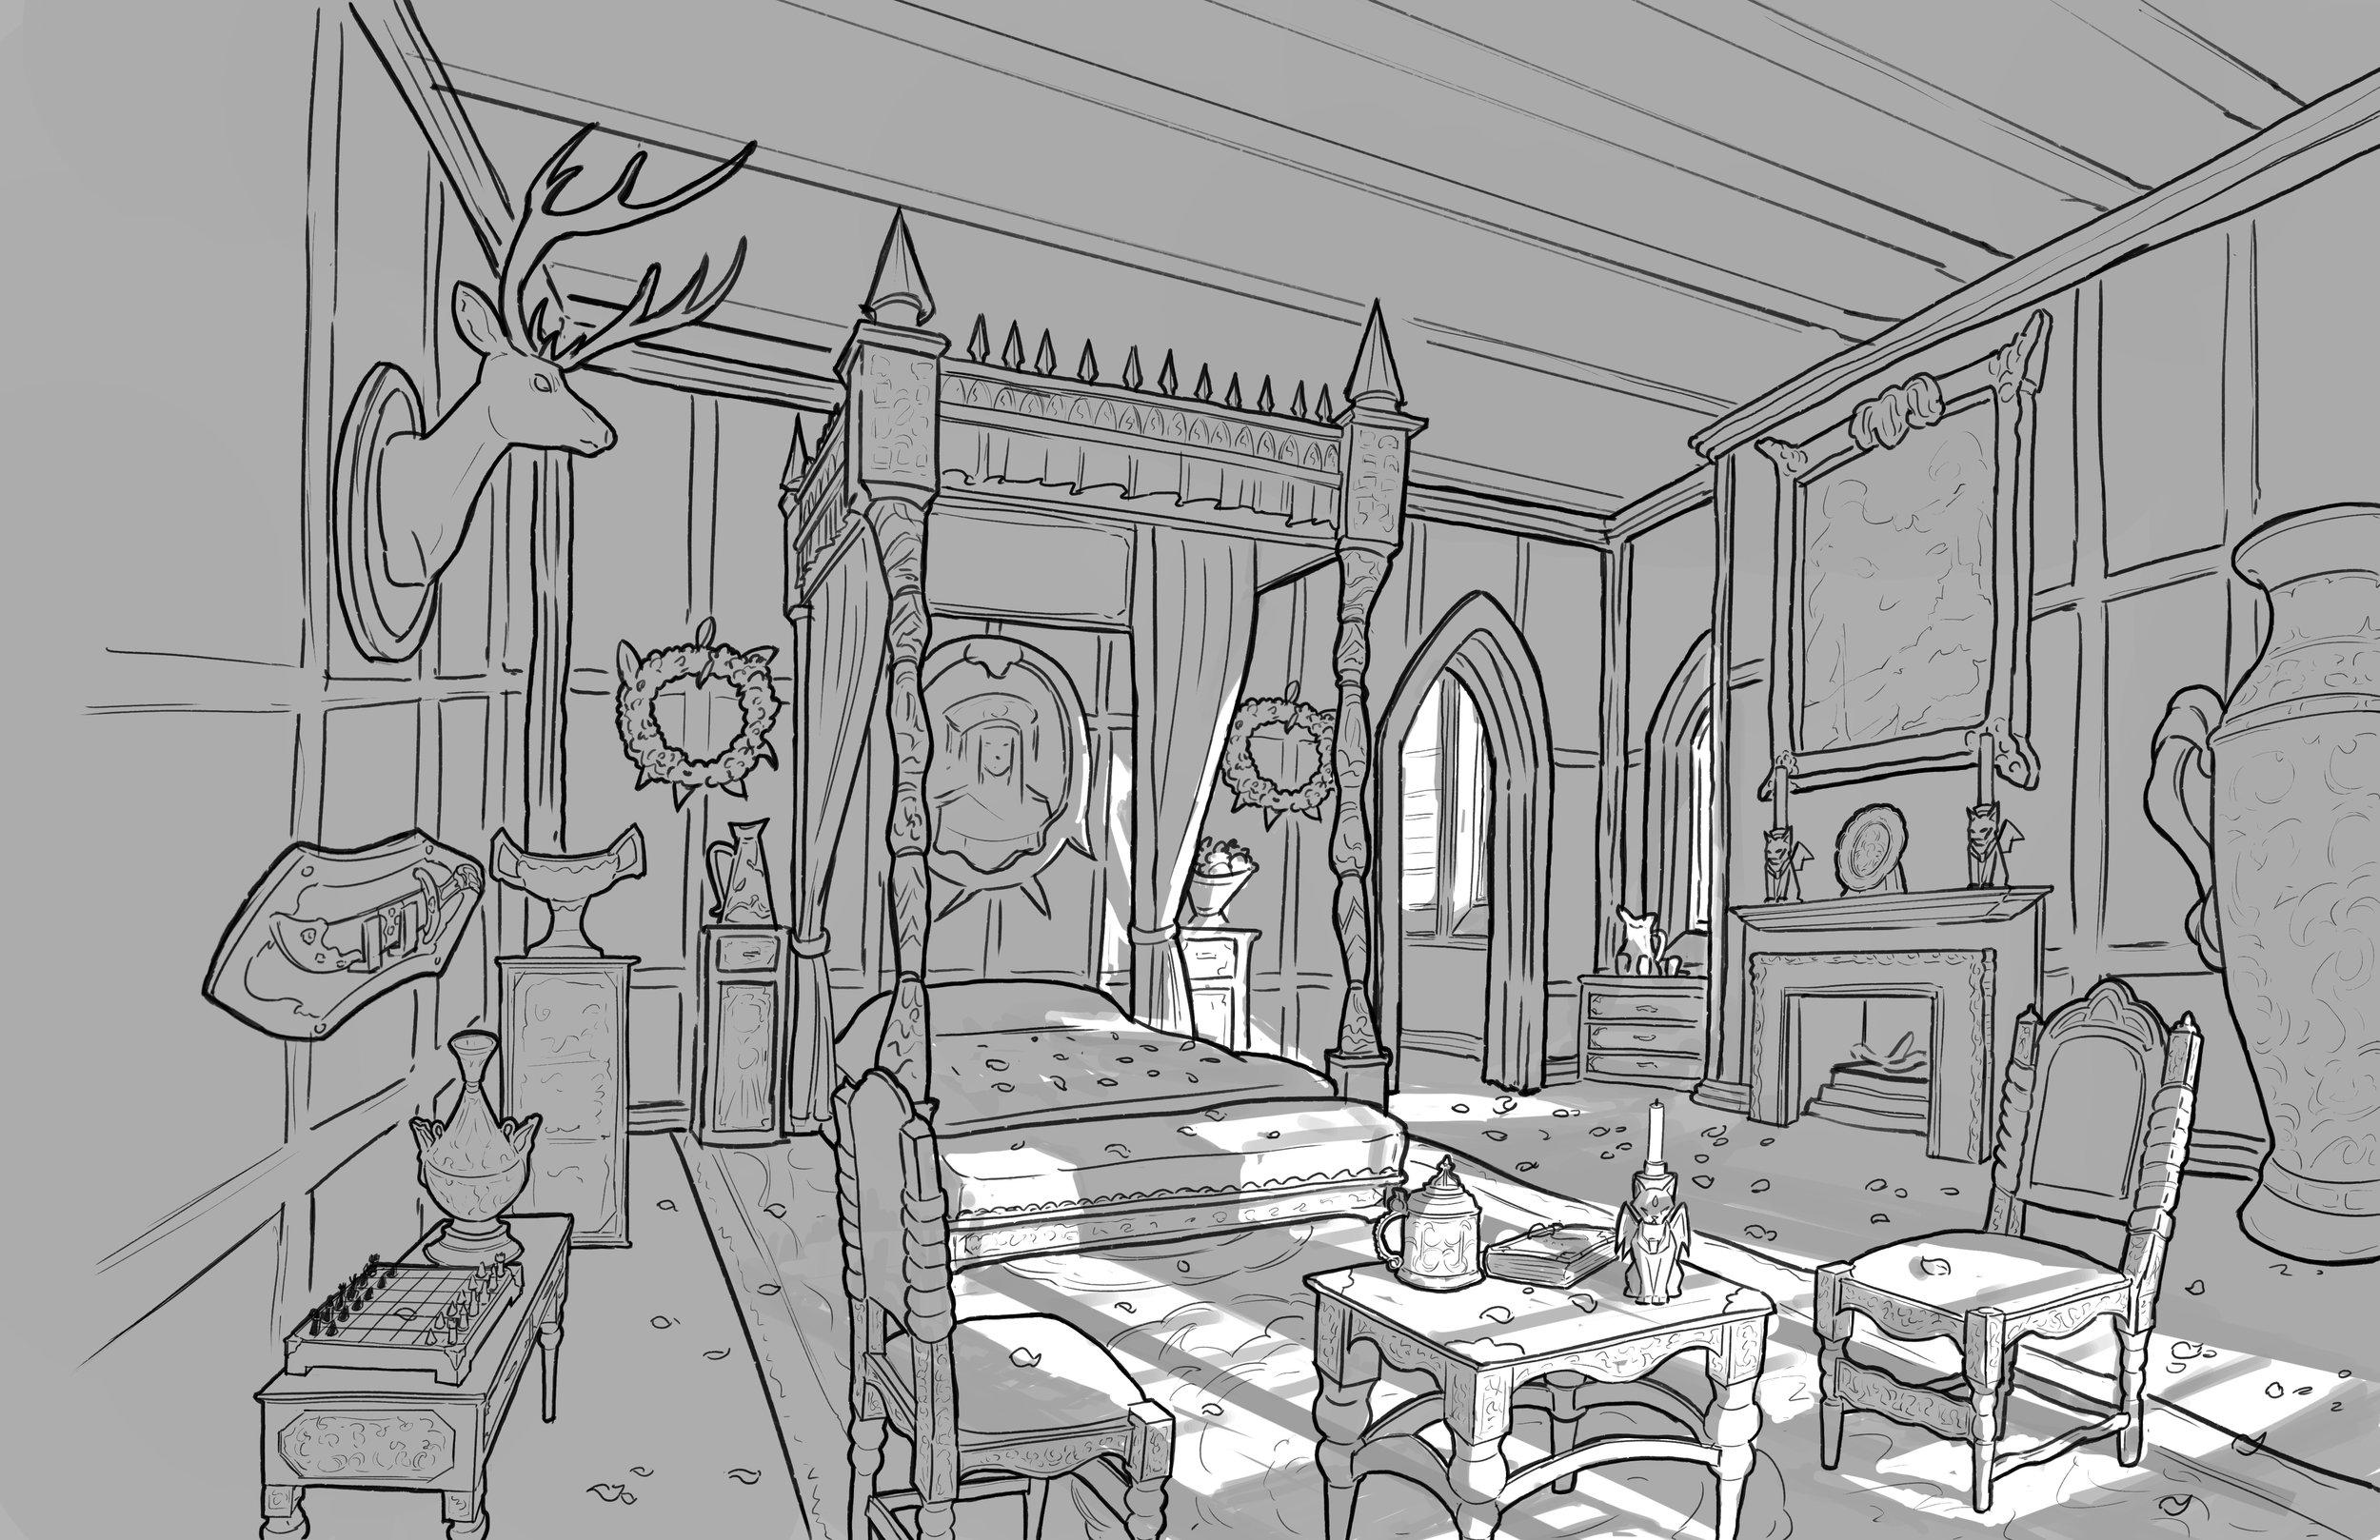 Project: Rumple, Duke's Chamber